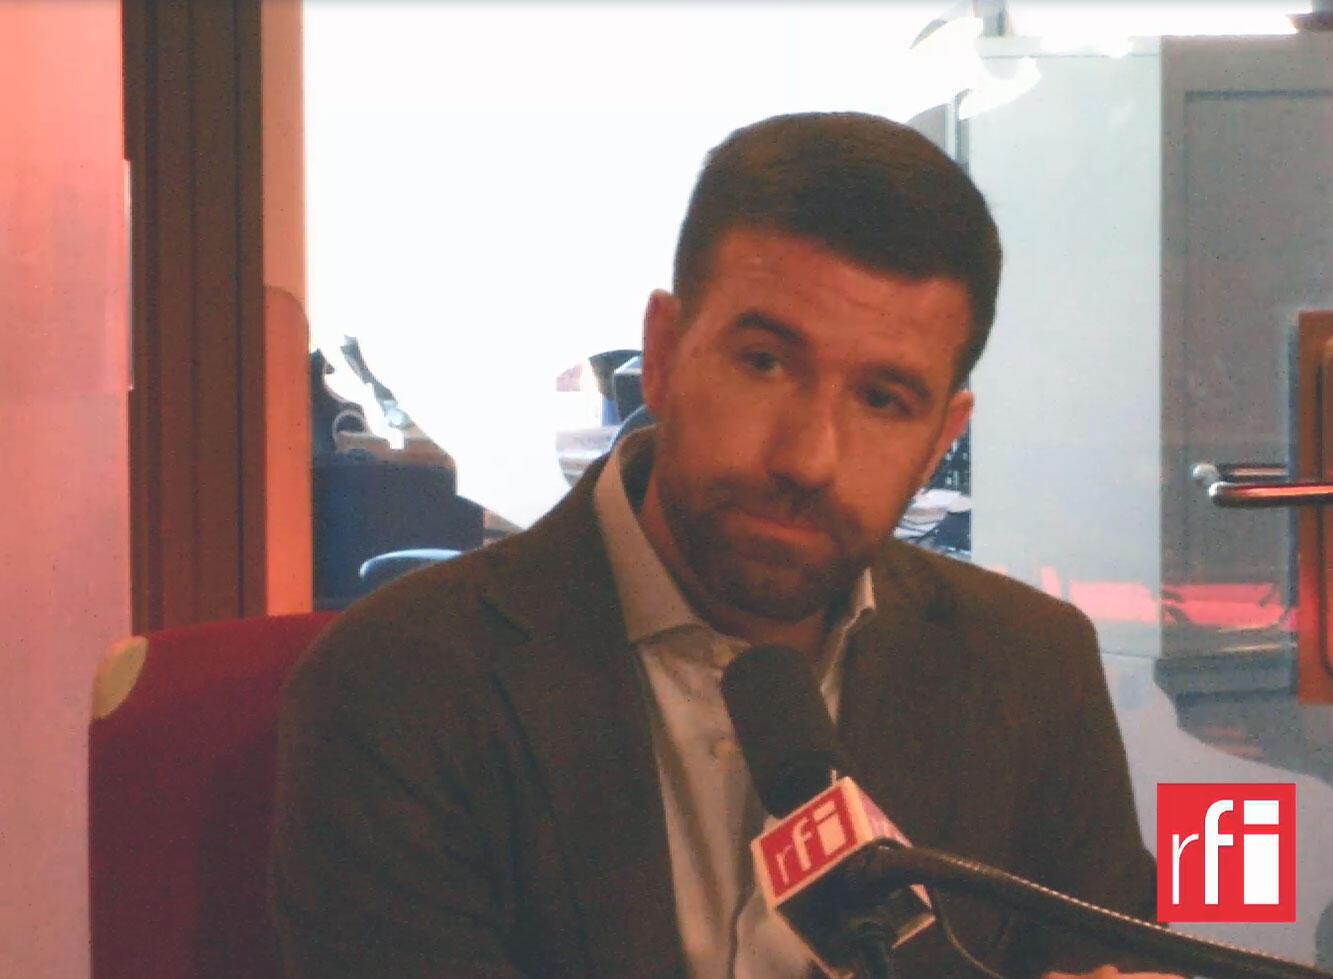 RFI Convida Ignacio Gavilan, diretor de sustentabilidade na entidade The Consumer Goods Forum - CGS.